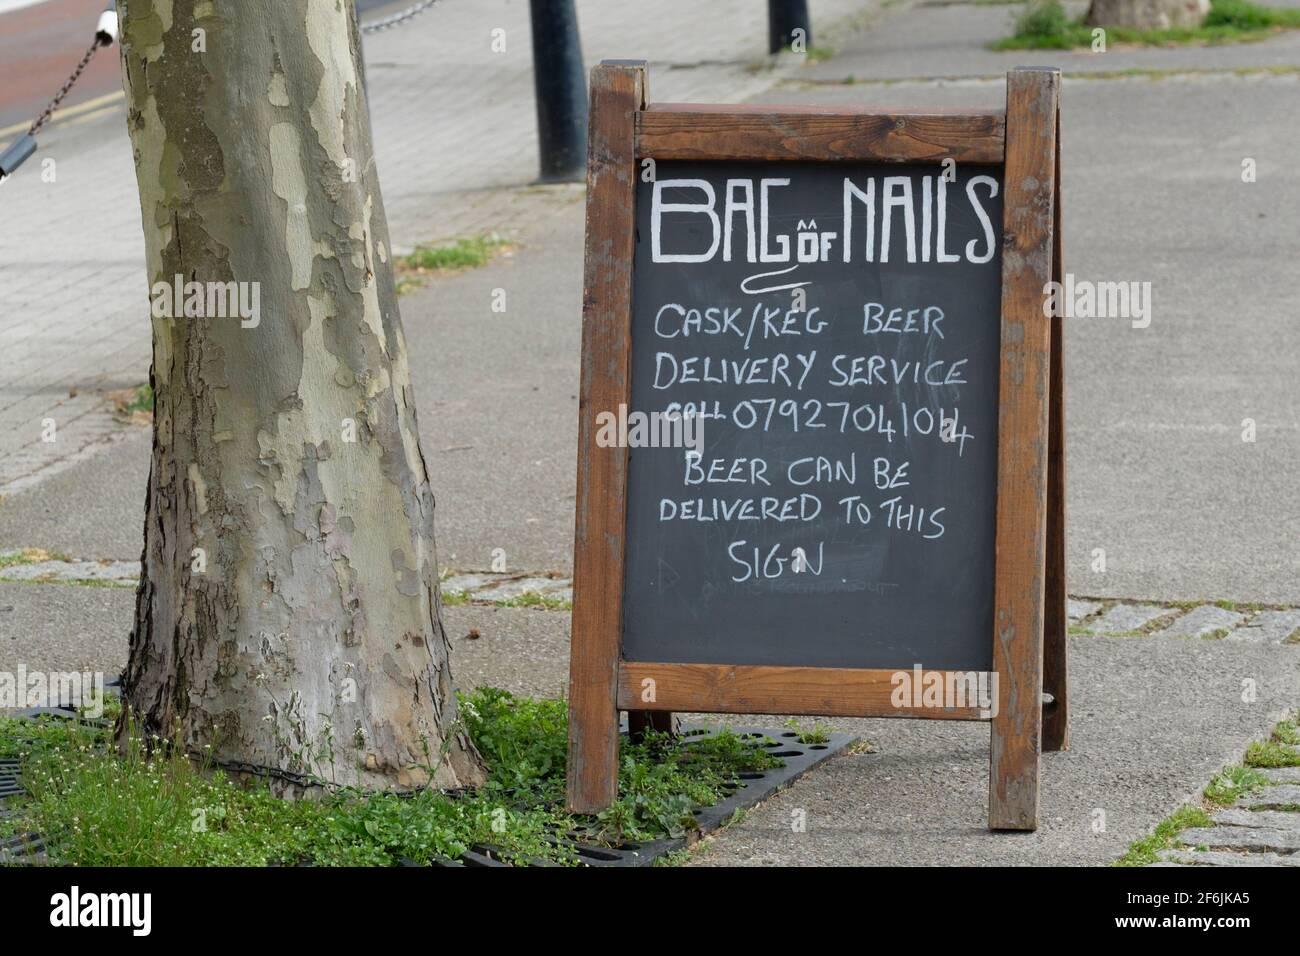 bristol-pub-the-bag-of-nails-pub-will-deliver-beer-a-board-menu-describes-beer-delivery-service-2F6JKA5.jpg